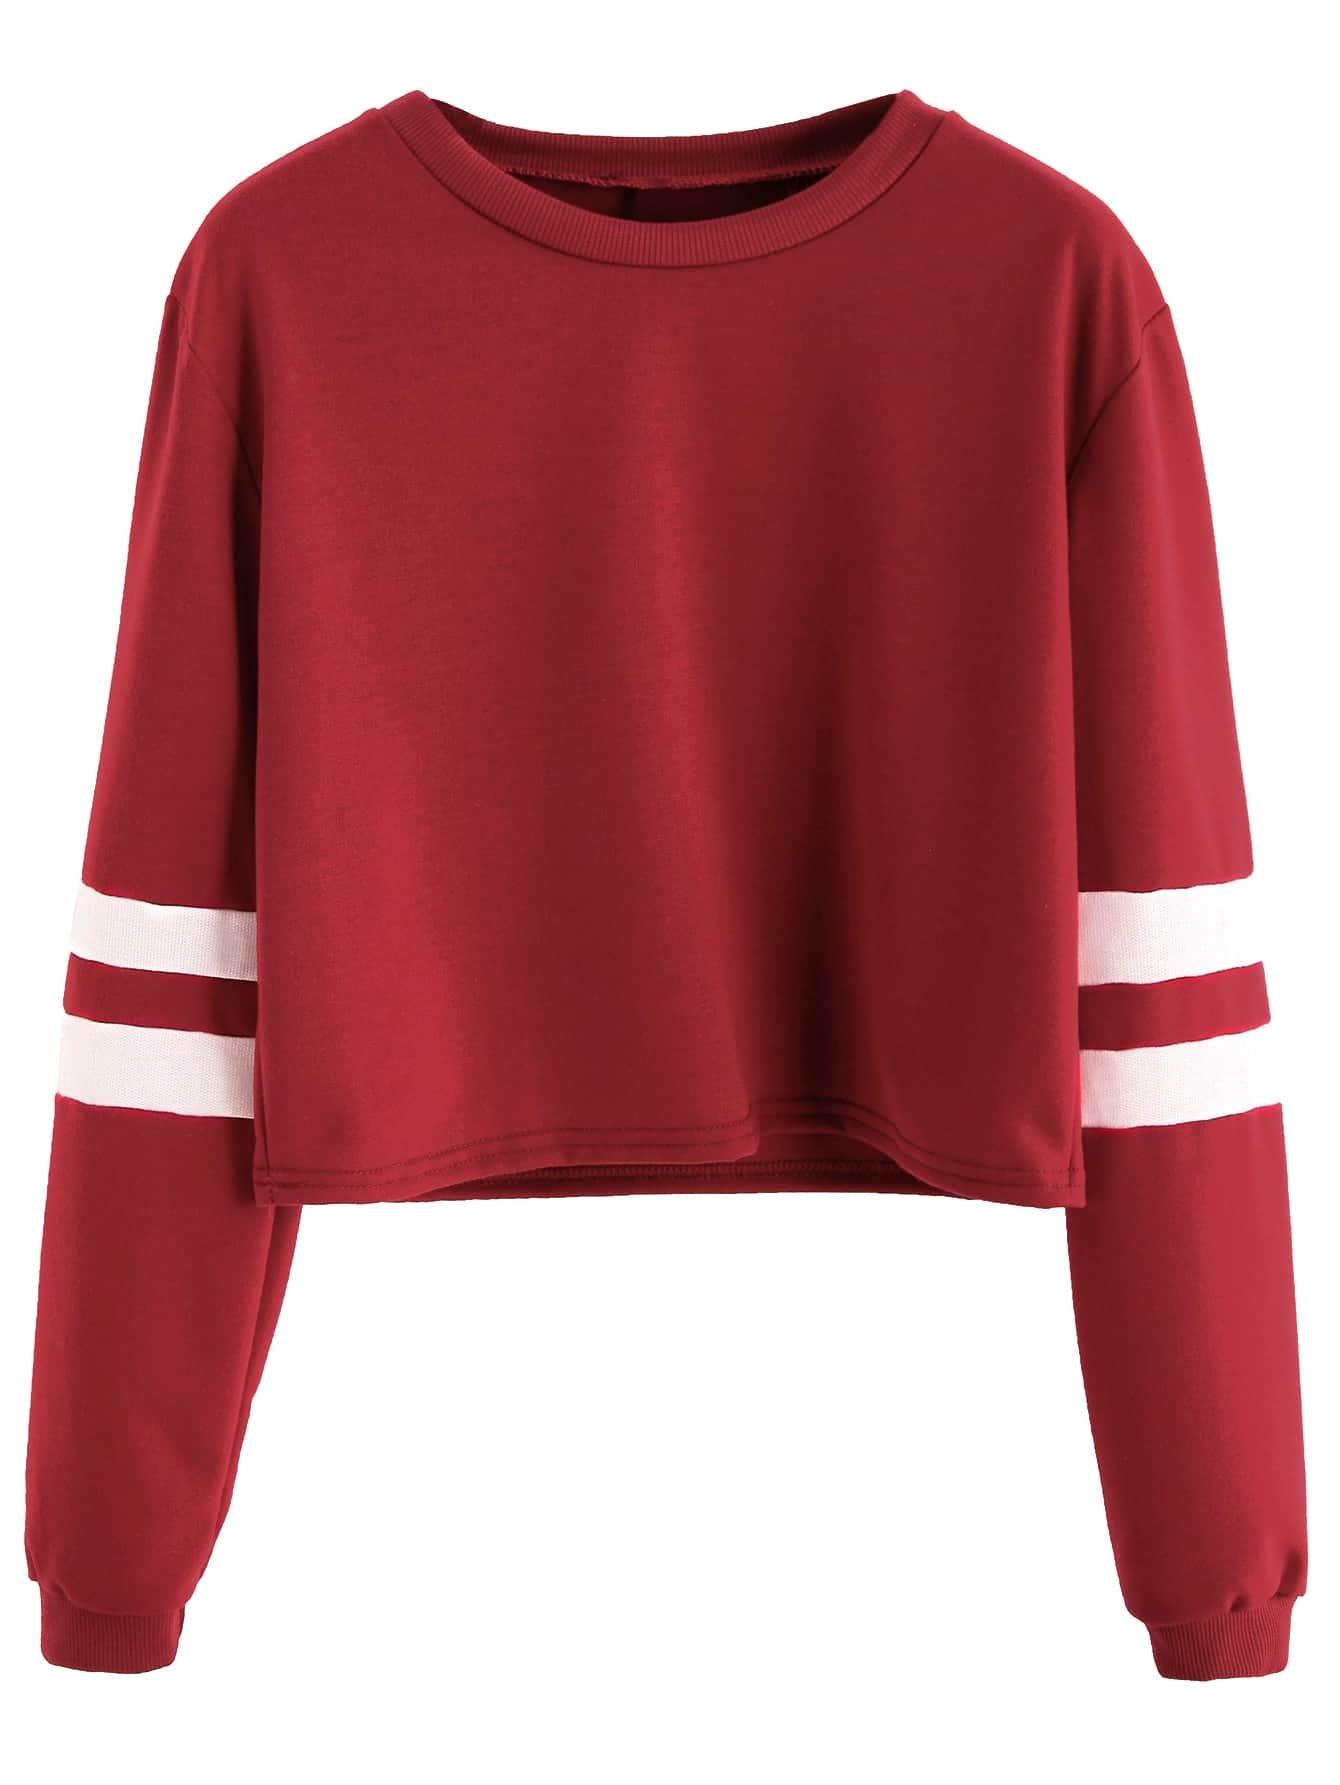 a752671c441 Burgundy Varsity Striped Sleeve Crop T-shirt EmmaCloth-Women Fast ...